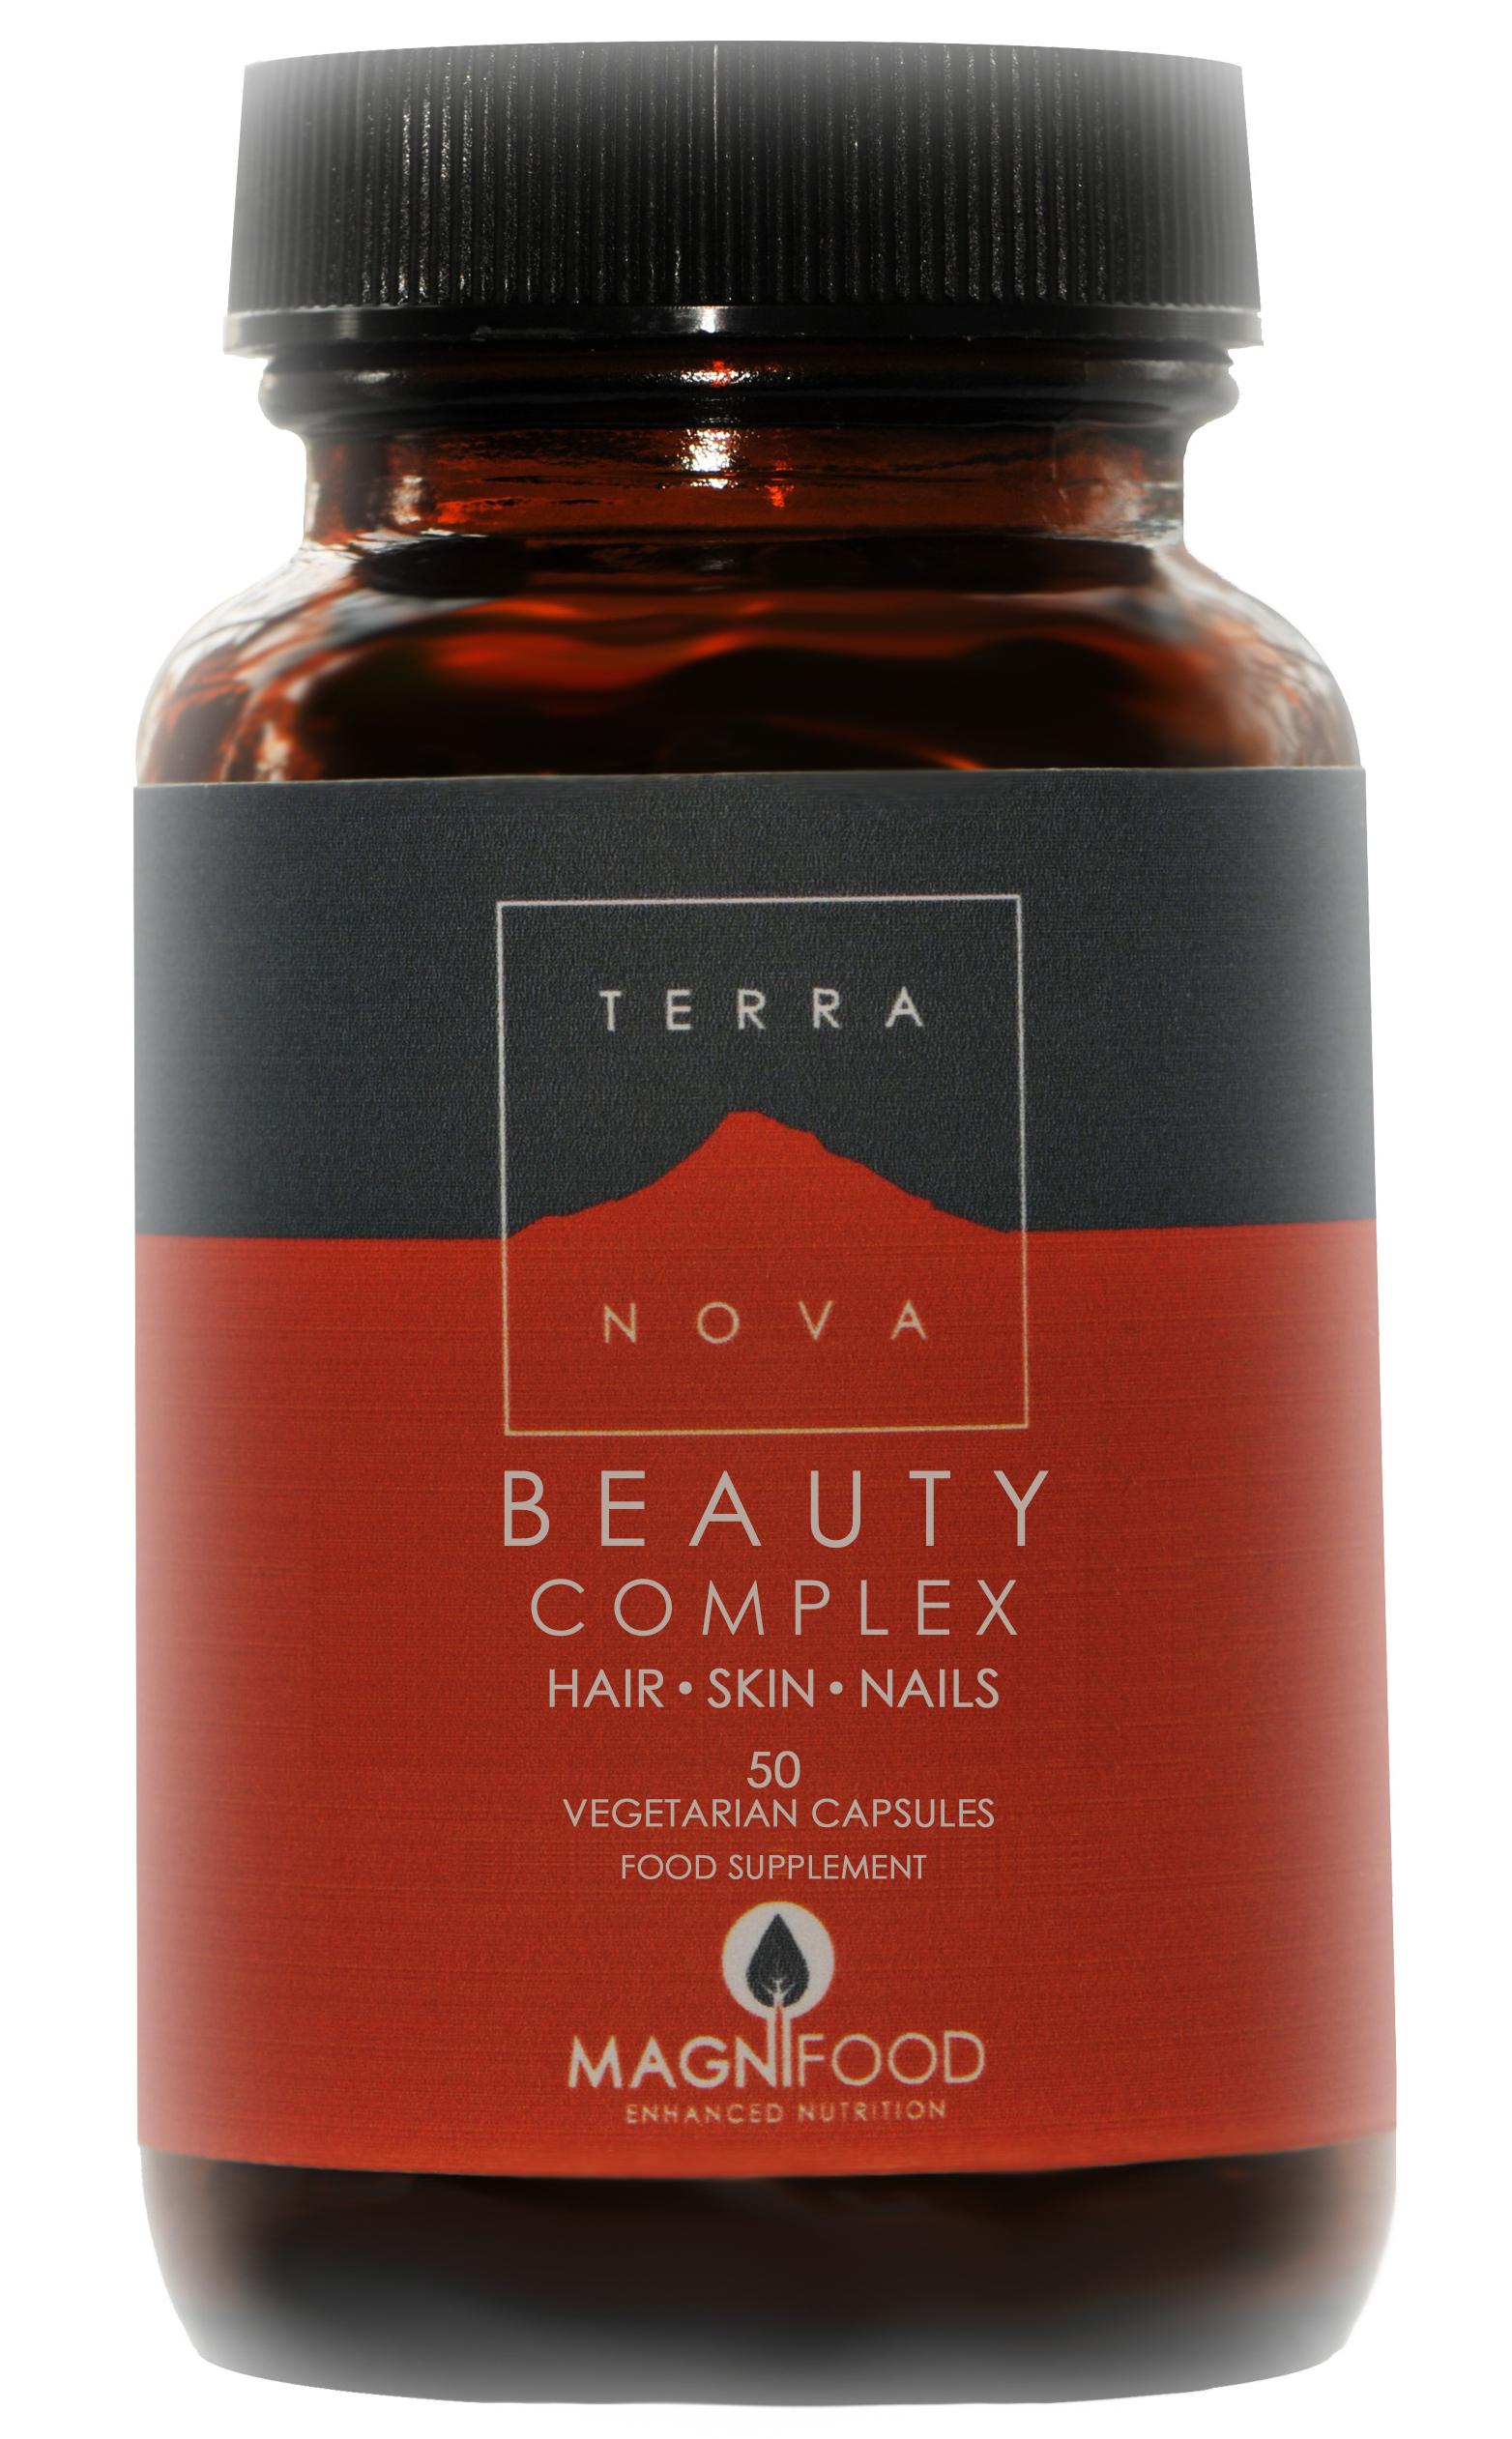 Terranova Beauty Complex Hair – Skin – Nails Ιδανική & Απόλυτα Φυσική Λύση για την Ενίσχυση της Ομορφιάς εκ των Έσω 50Caps